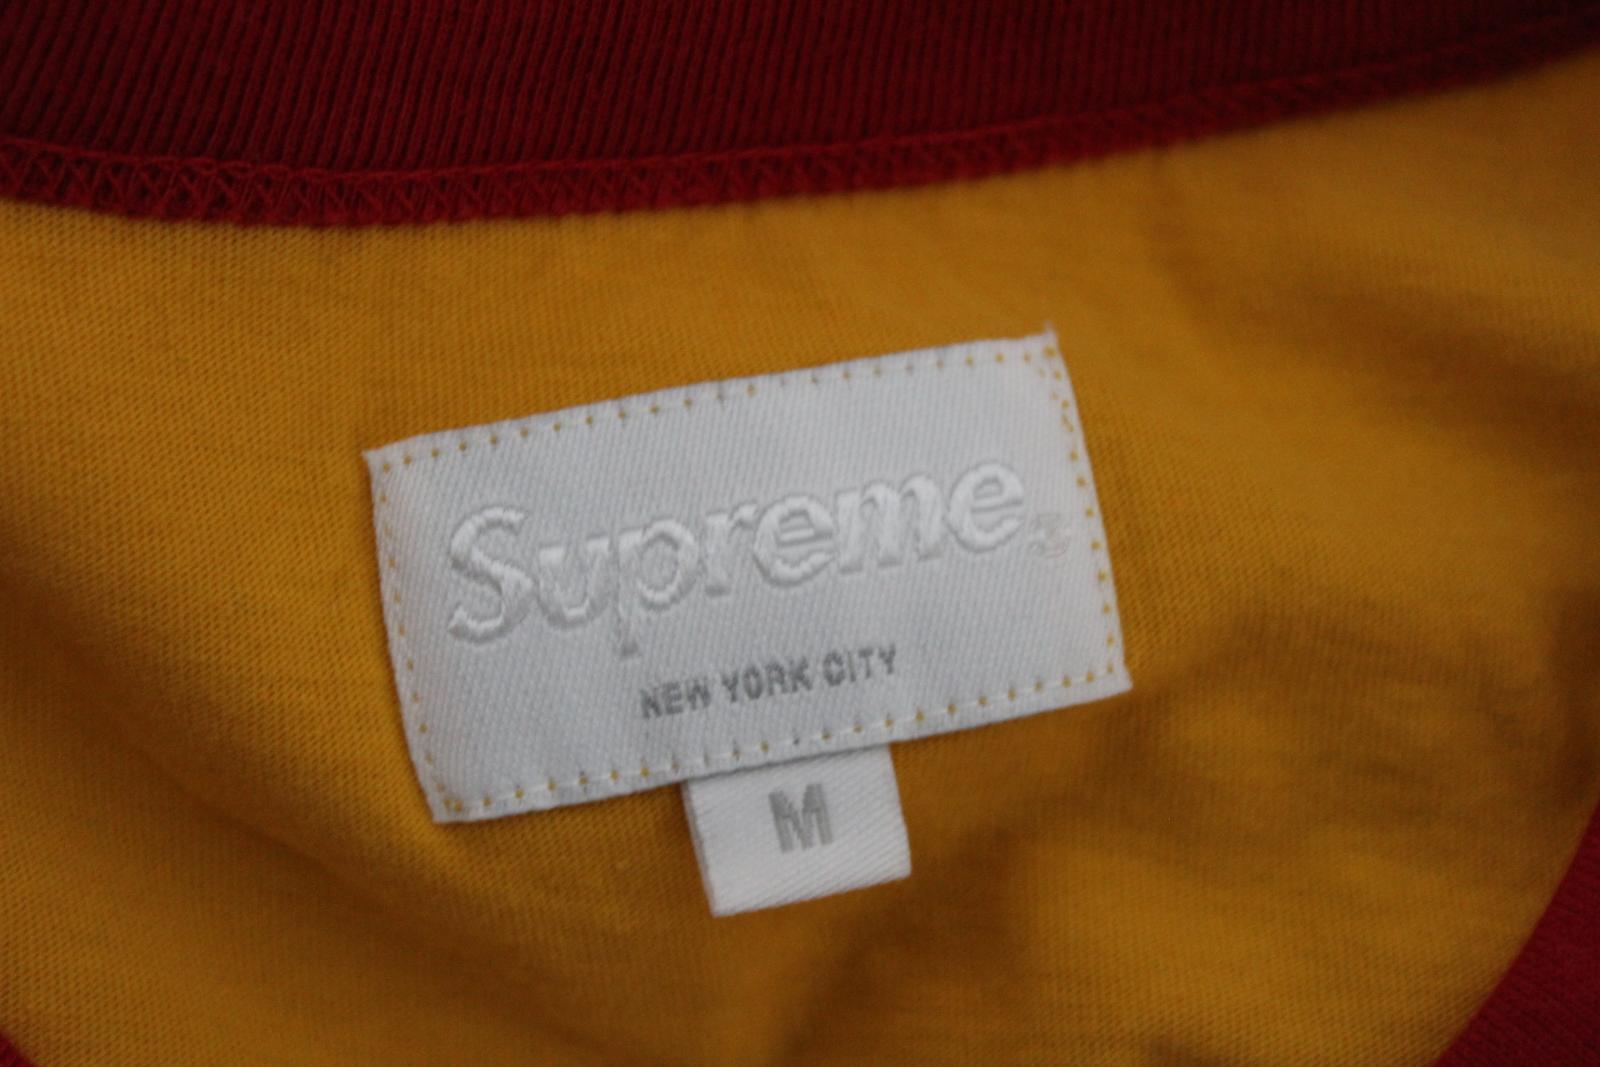 f200756e9e19 SUPREME Men's Yellow Cotton Short Sleeve Vampirella Graphic T-Shirt Size M  9 9 of 12 See More